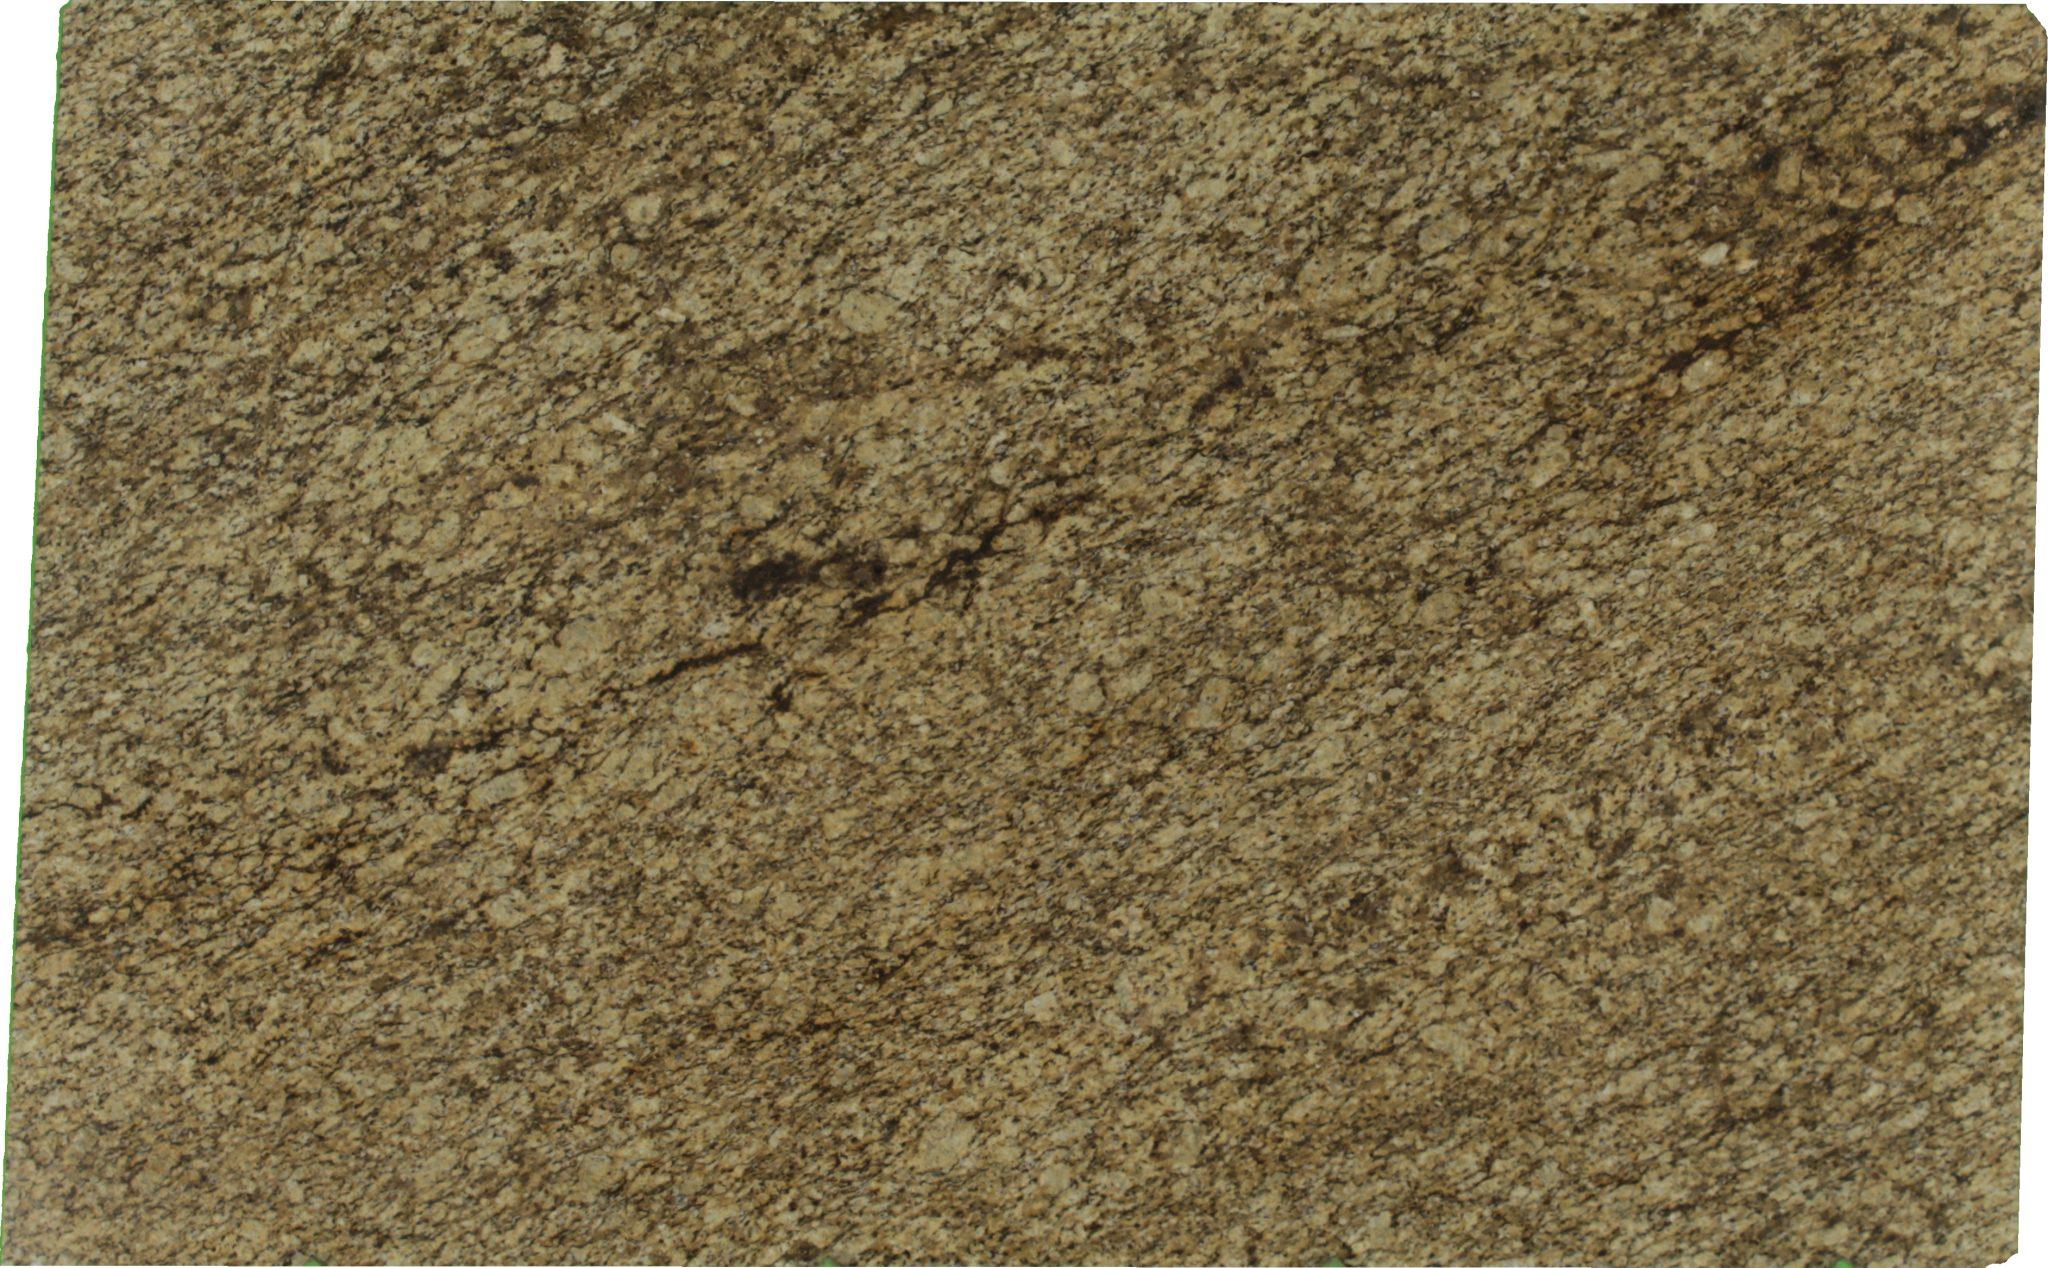 Crema Gold Granite Countertop Solutions Slab Inventory